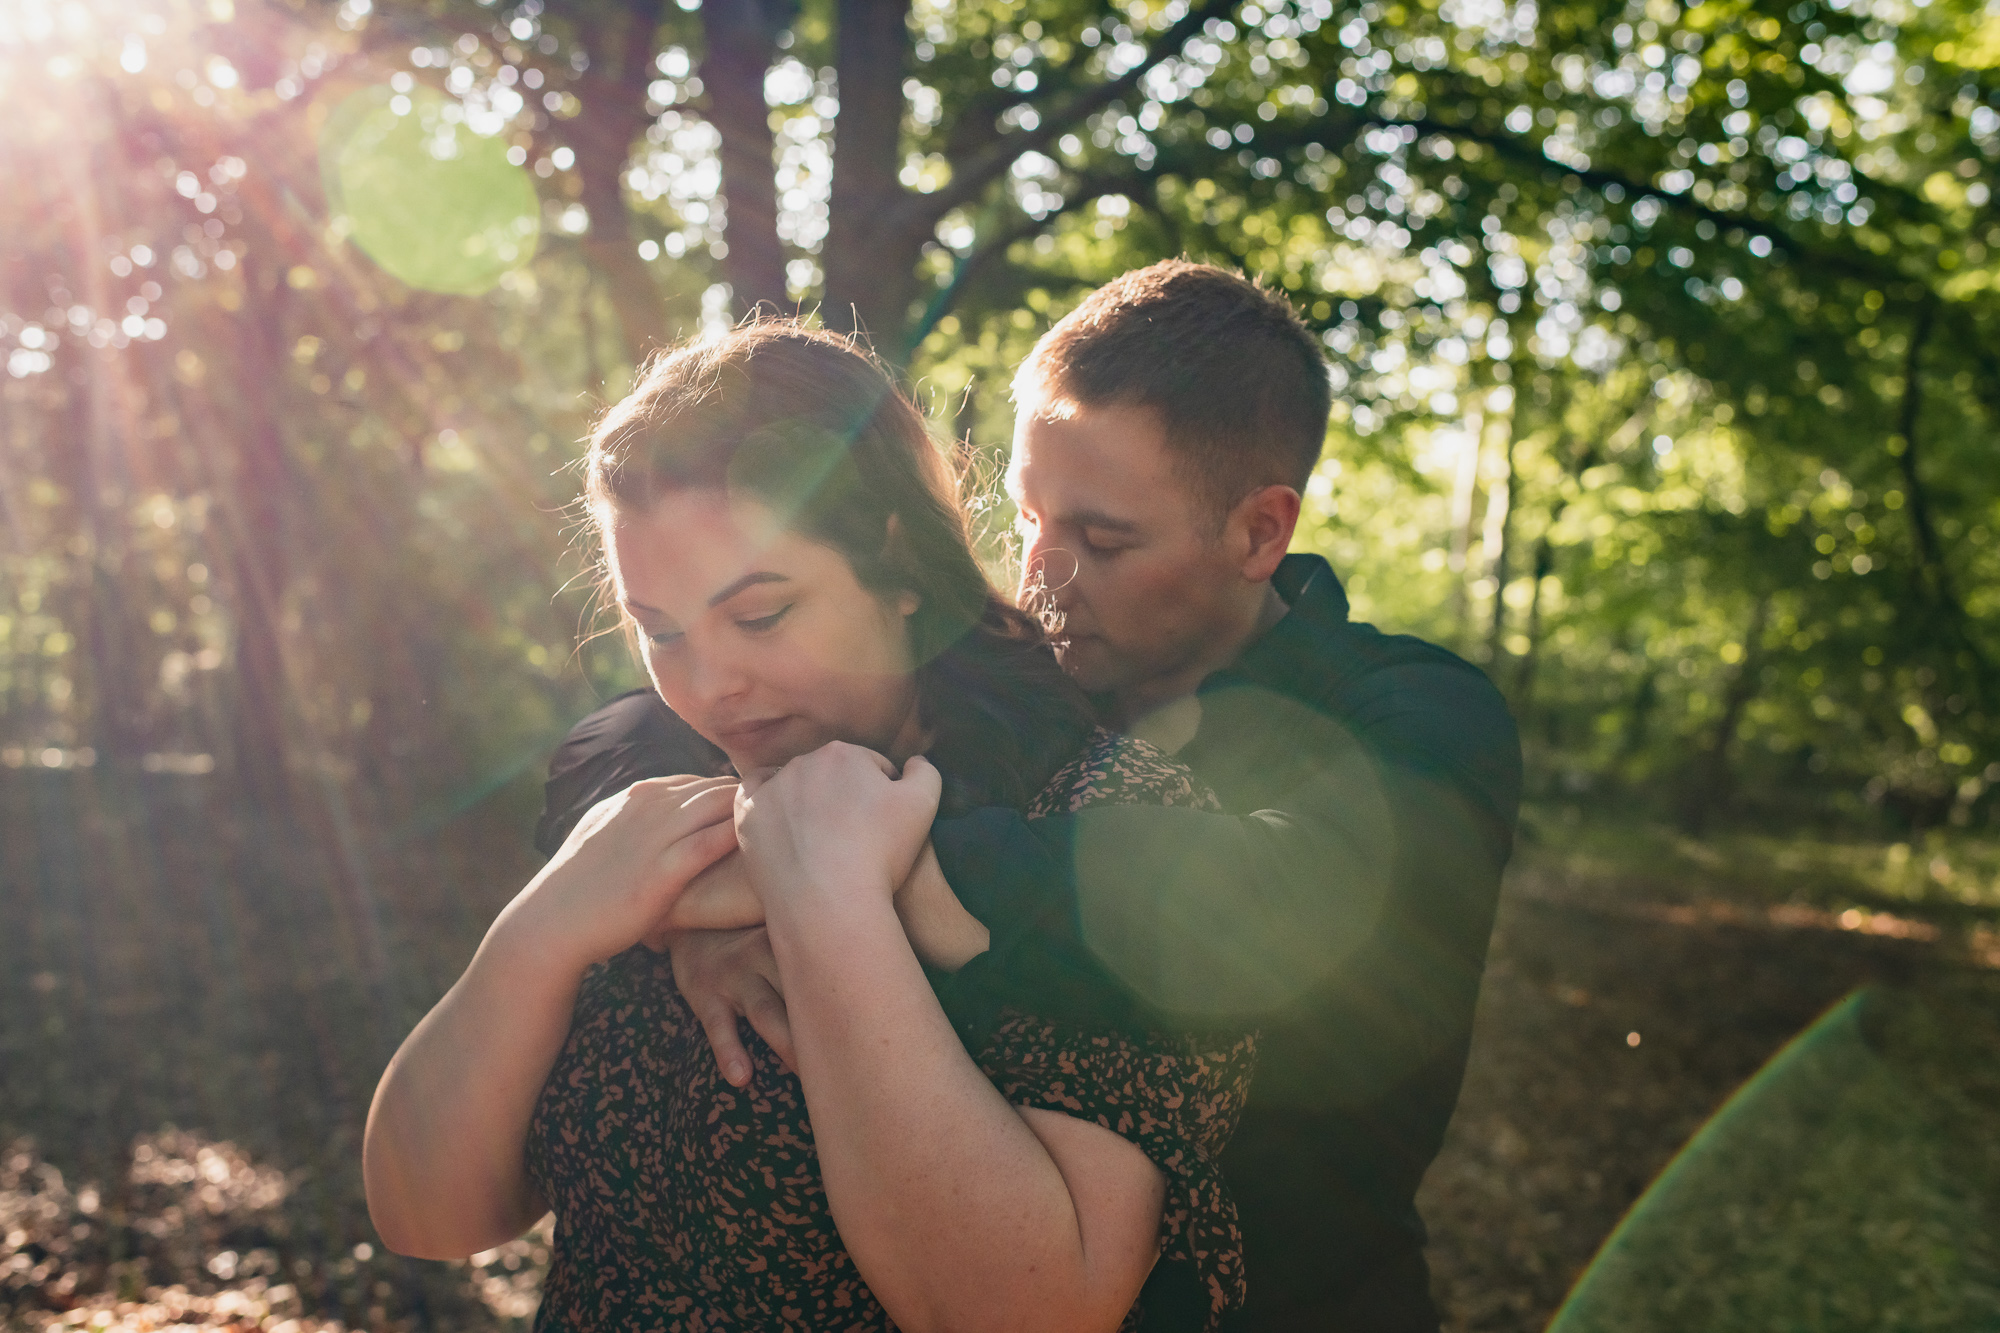 Wellington Wood pre-wedding shoot – Jess & Callum